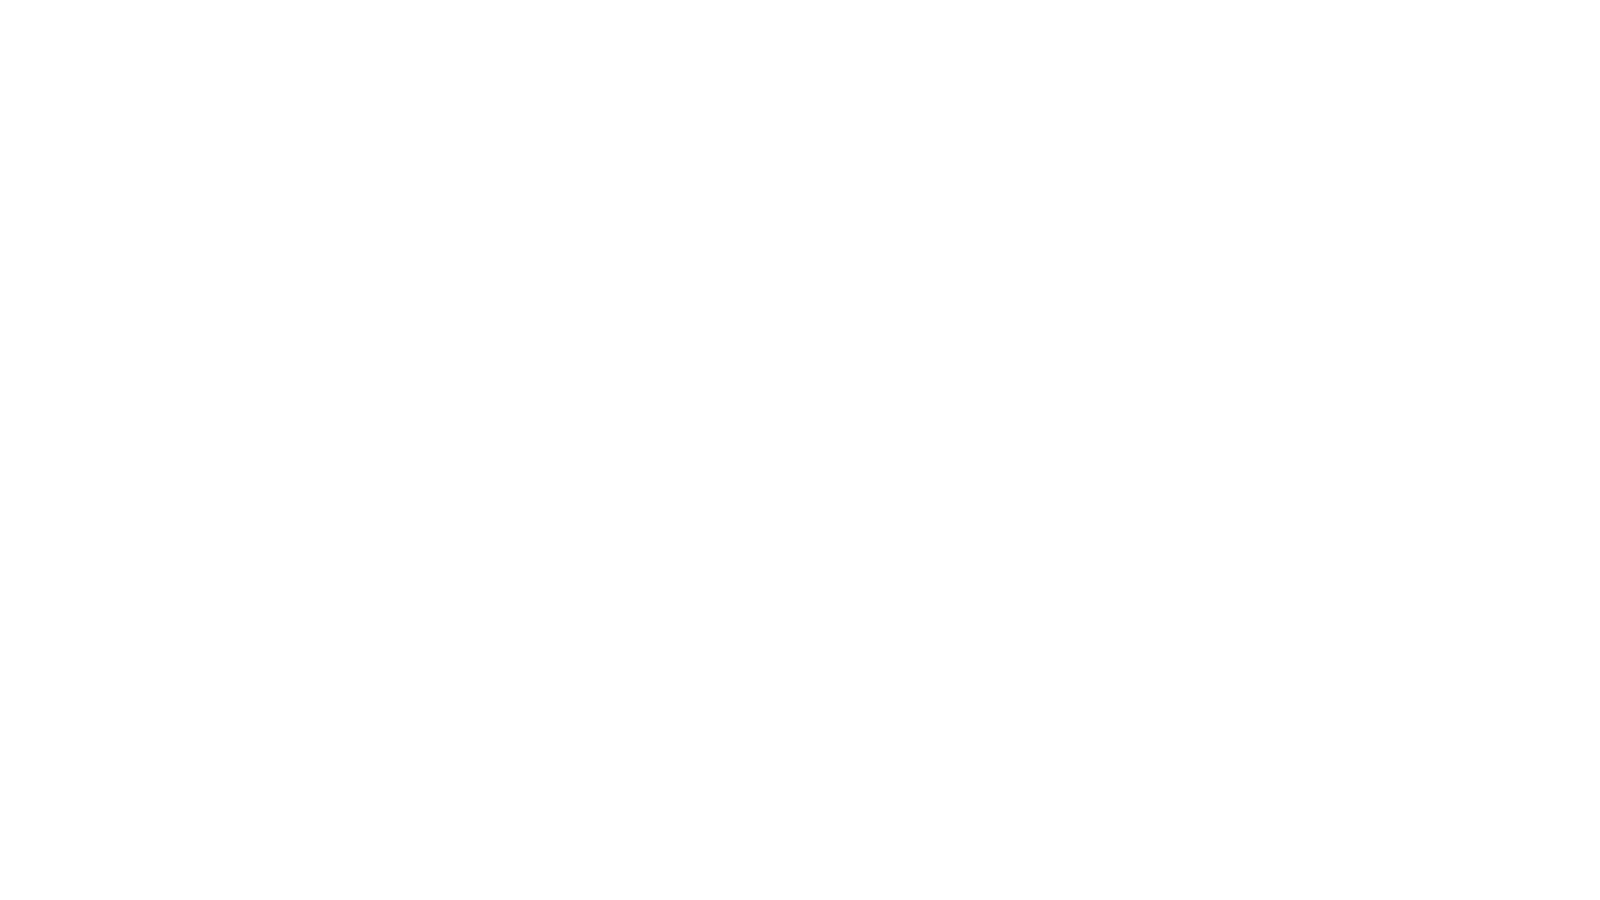 Provided to YouTube by CDBaby  Attunement · Aroshanti  Reiki Relaxation  ℗ 2013 Aroshanti  Released on: 2013-05-01  Auto-generated by YouTube.